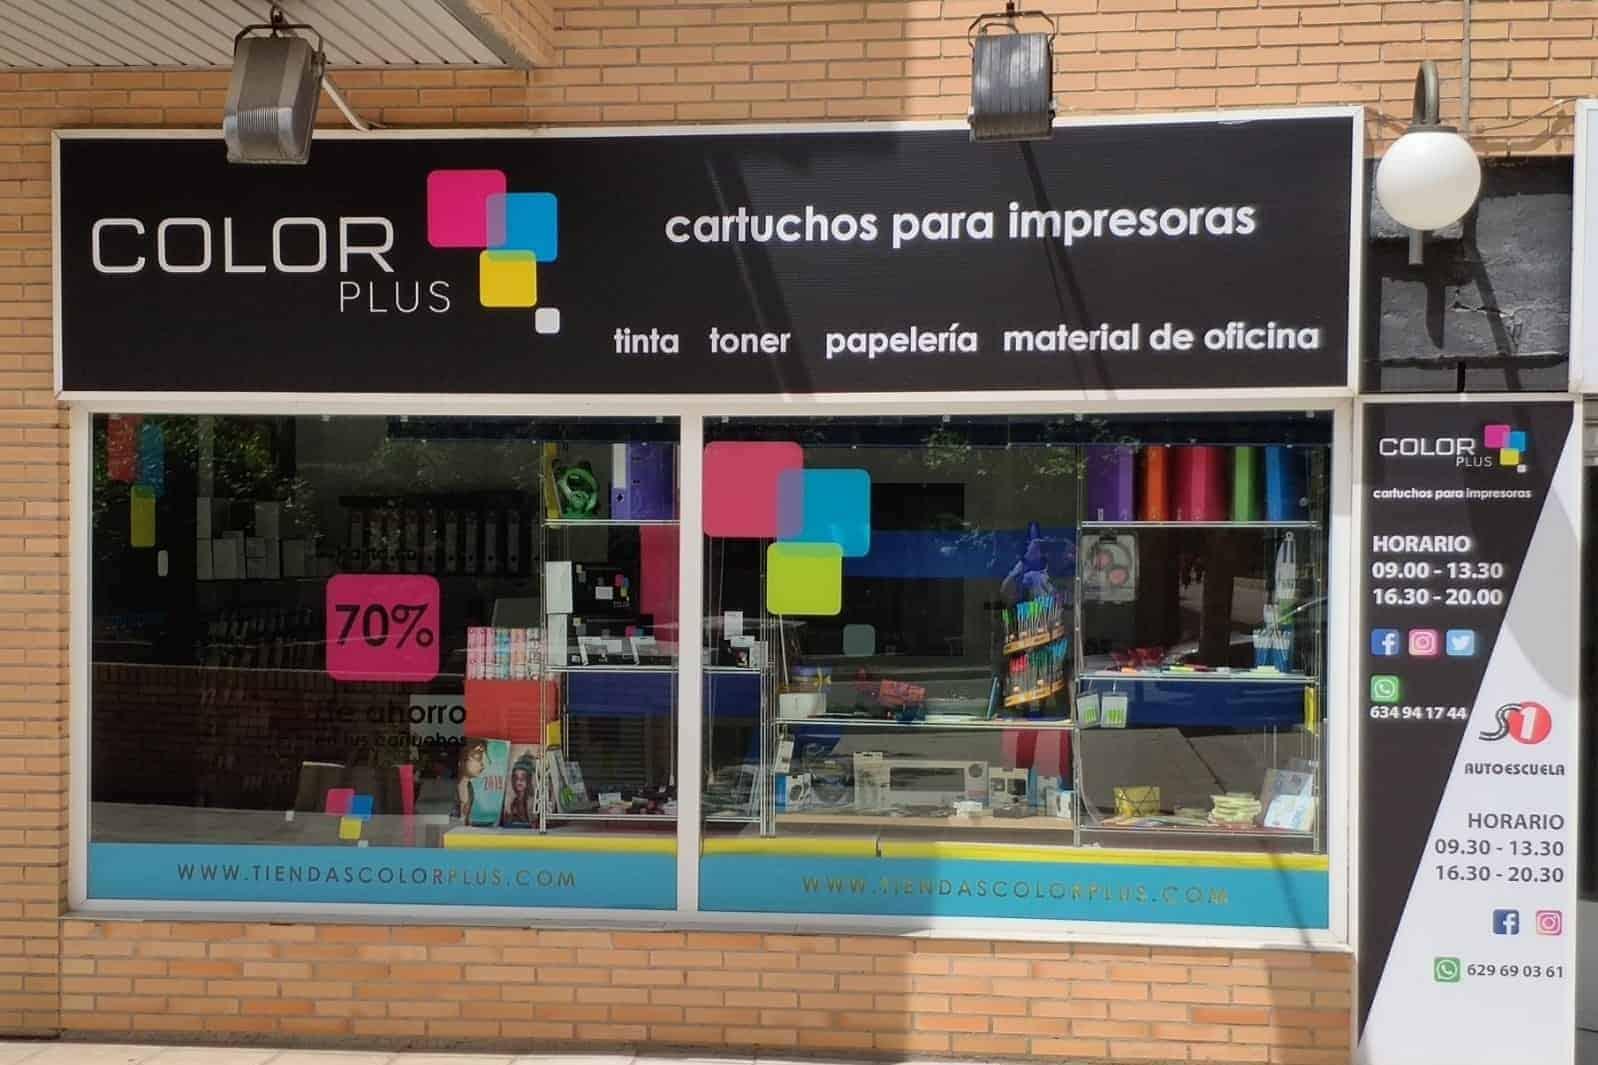 Color plus AFA